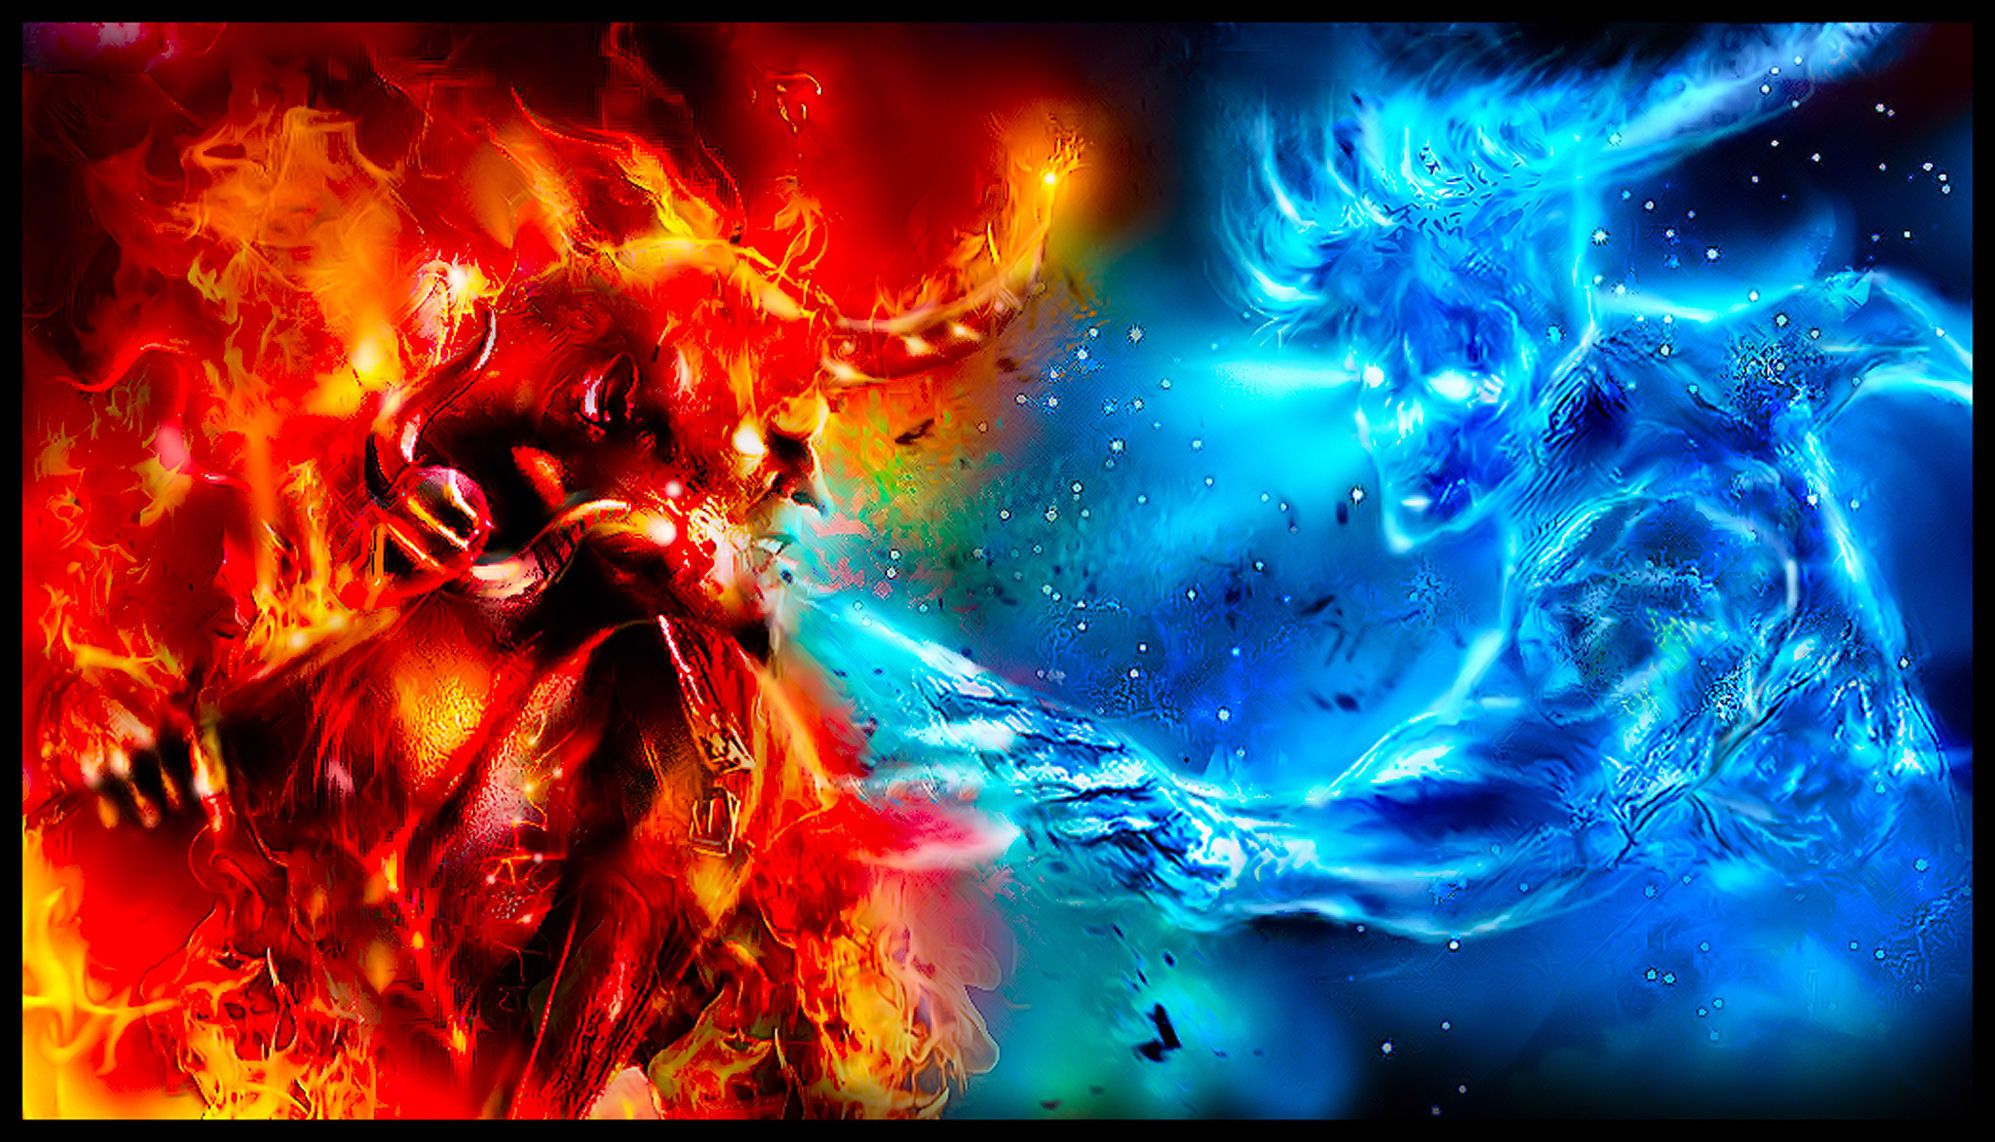 Fire & Ice Image